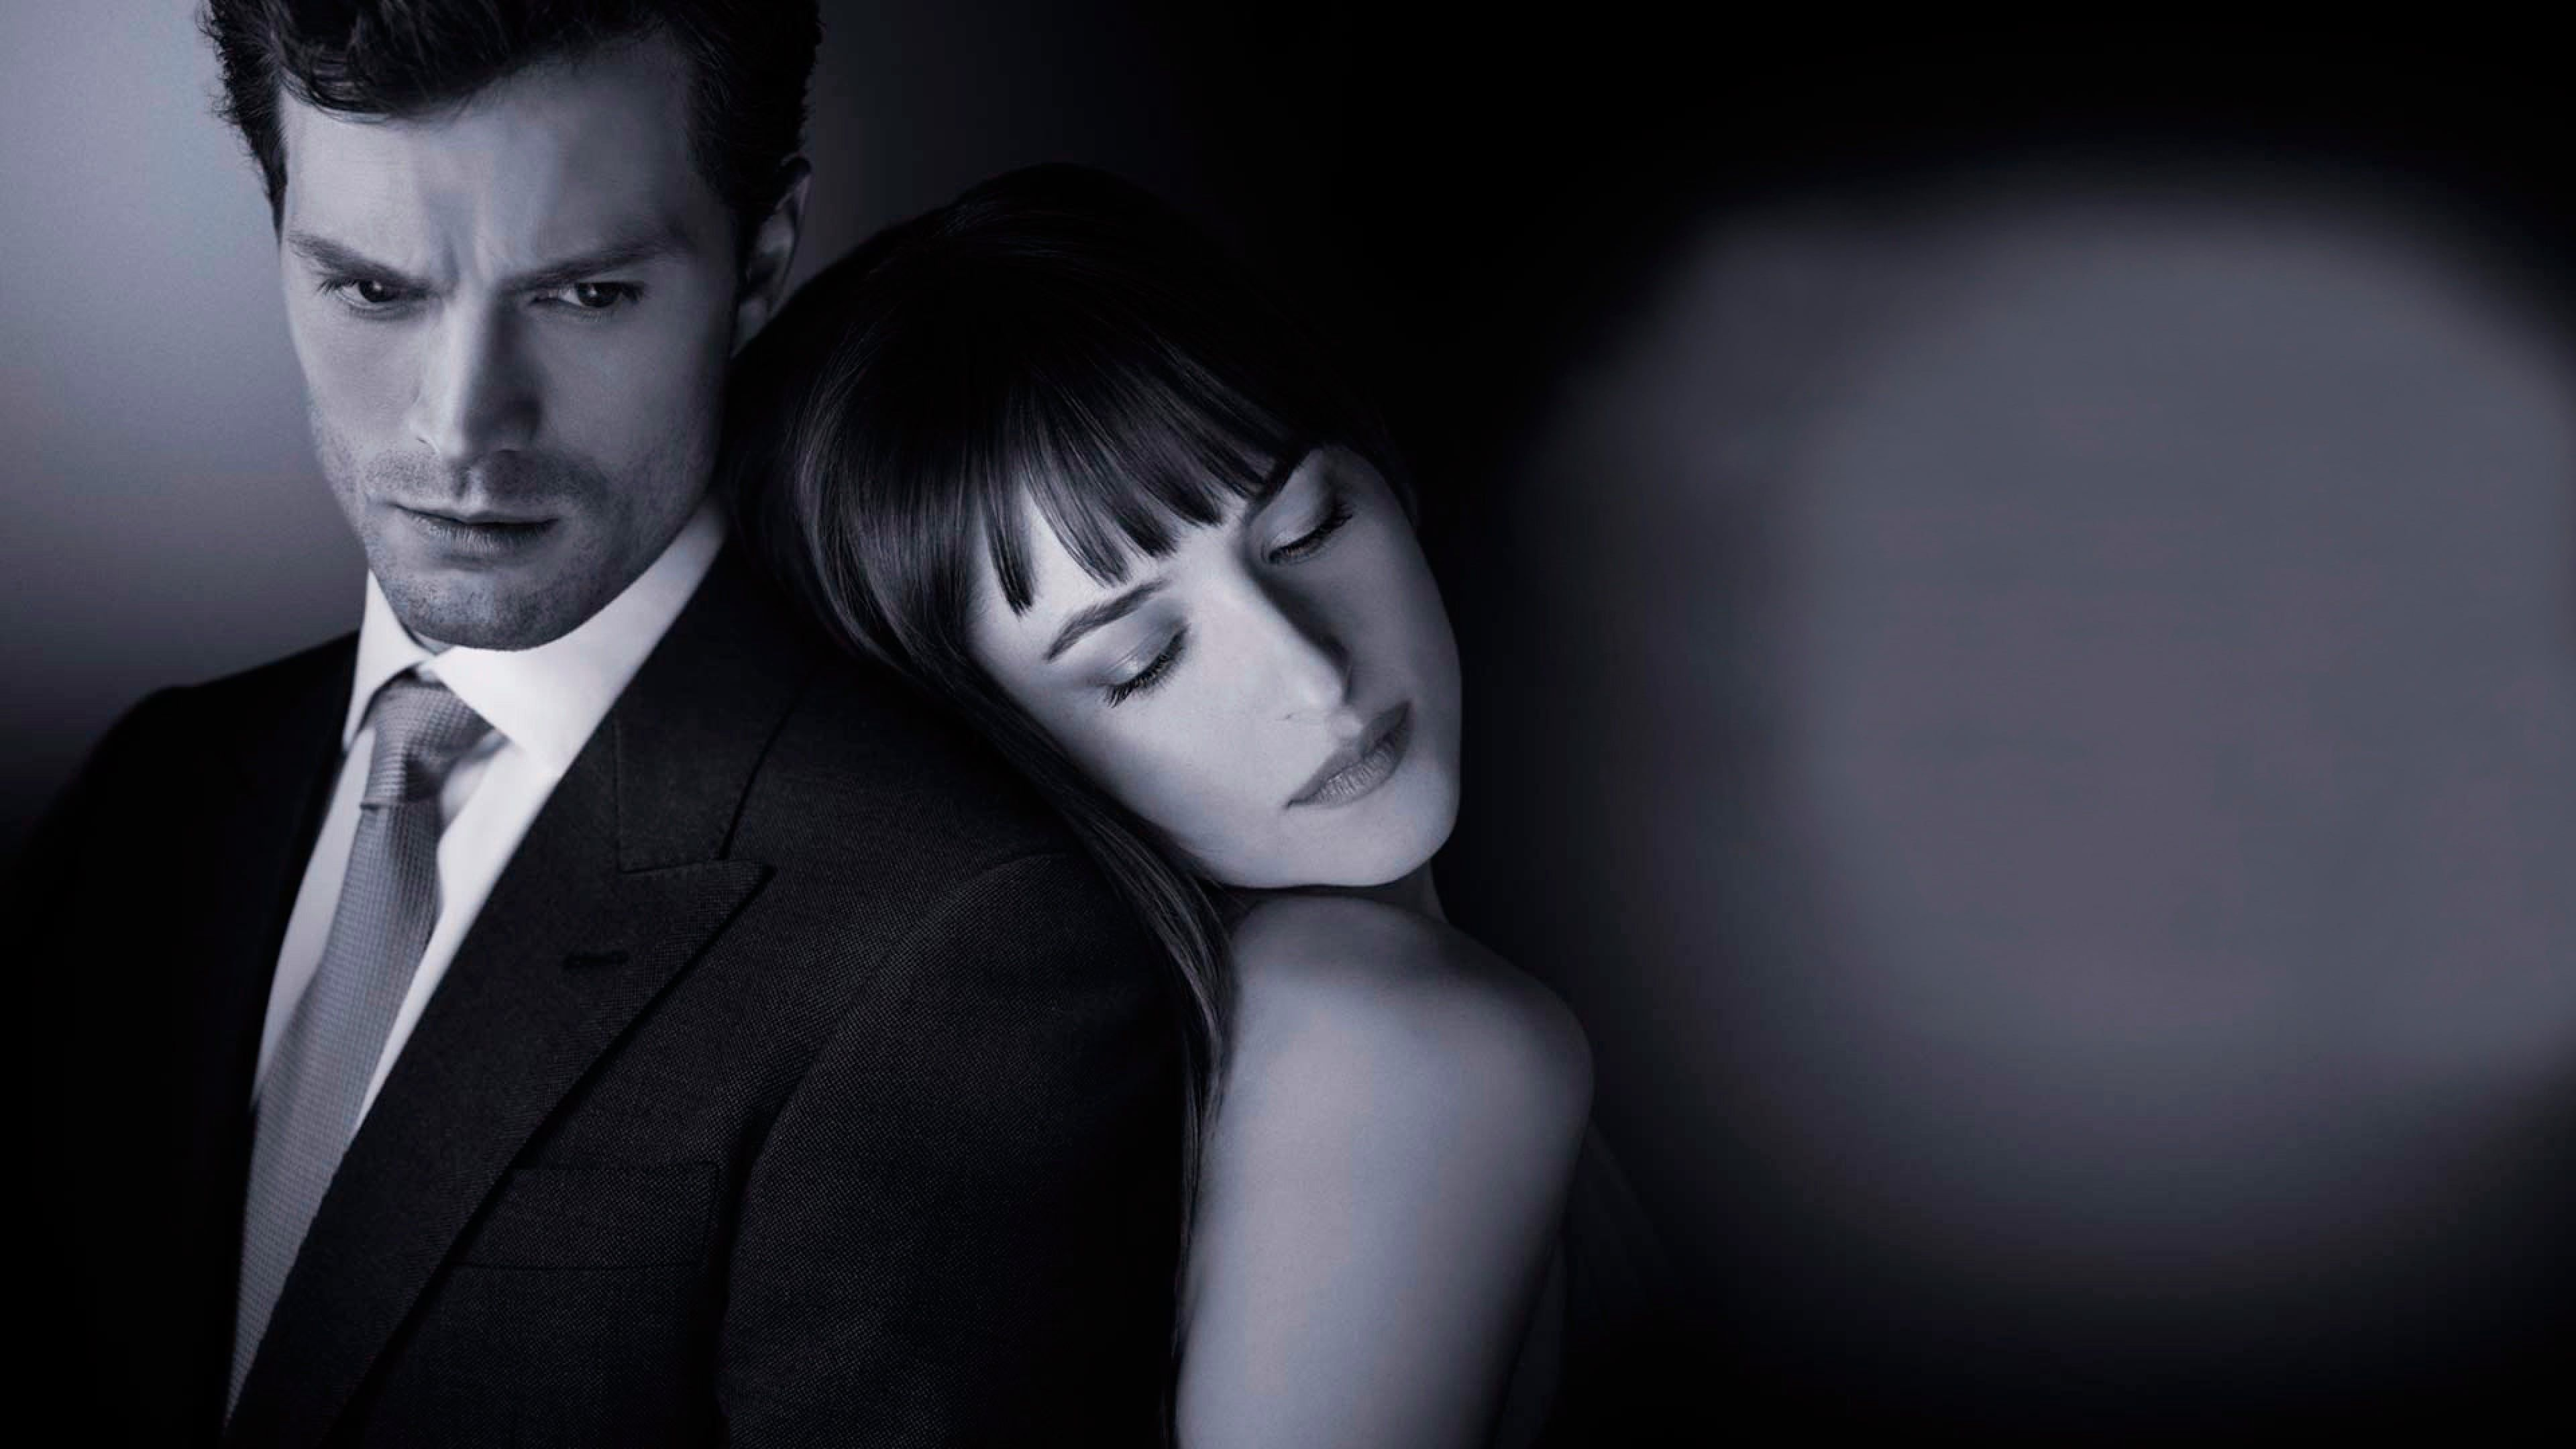 A Szurke Otven Arnyalata 2015 Online Teljes Film Filmek Magyarul Letoltes Hd Anastasia Steele Egy Fifty Shades Darker Fifty Shades Of Grey Fifty Shades Movie